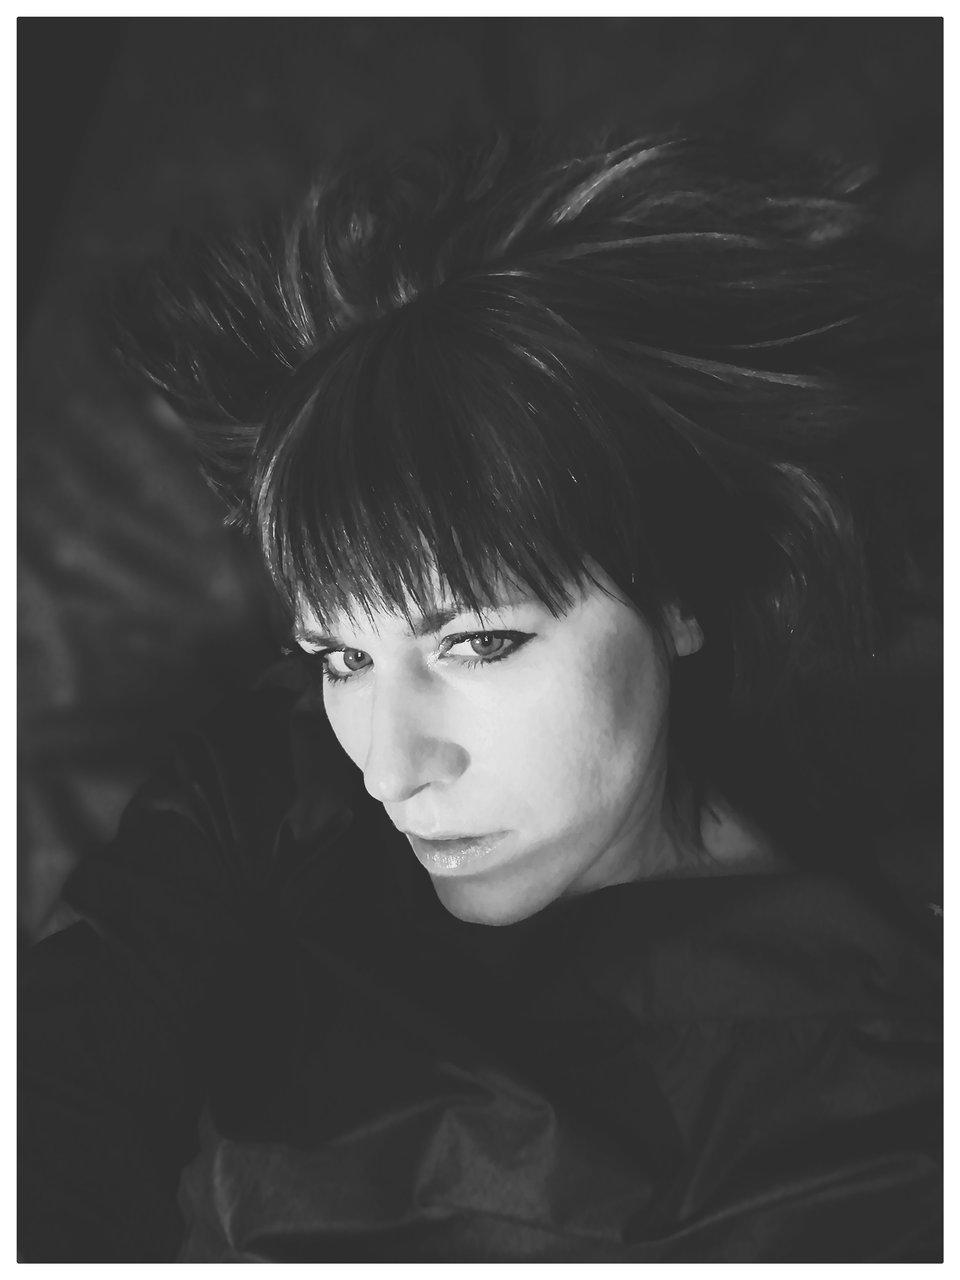 Photo in Portrait | Author loshka | PHOTO FORUM